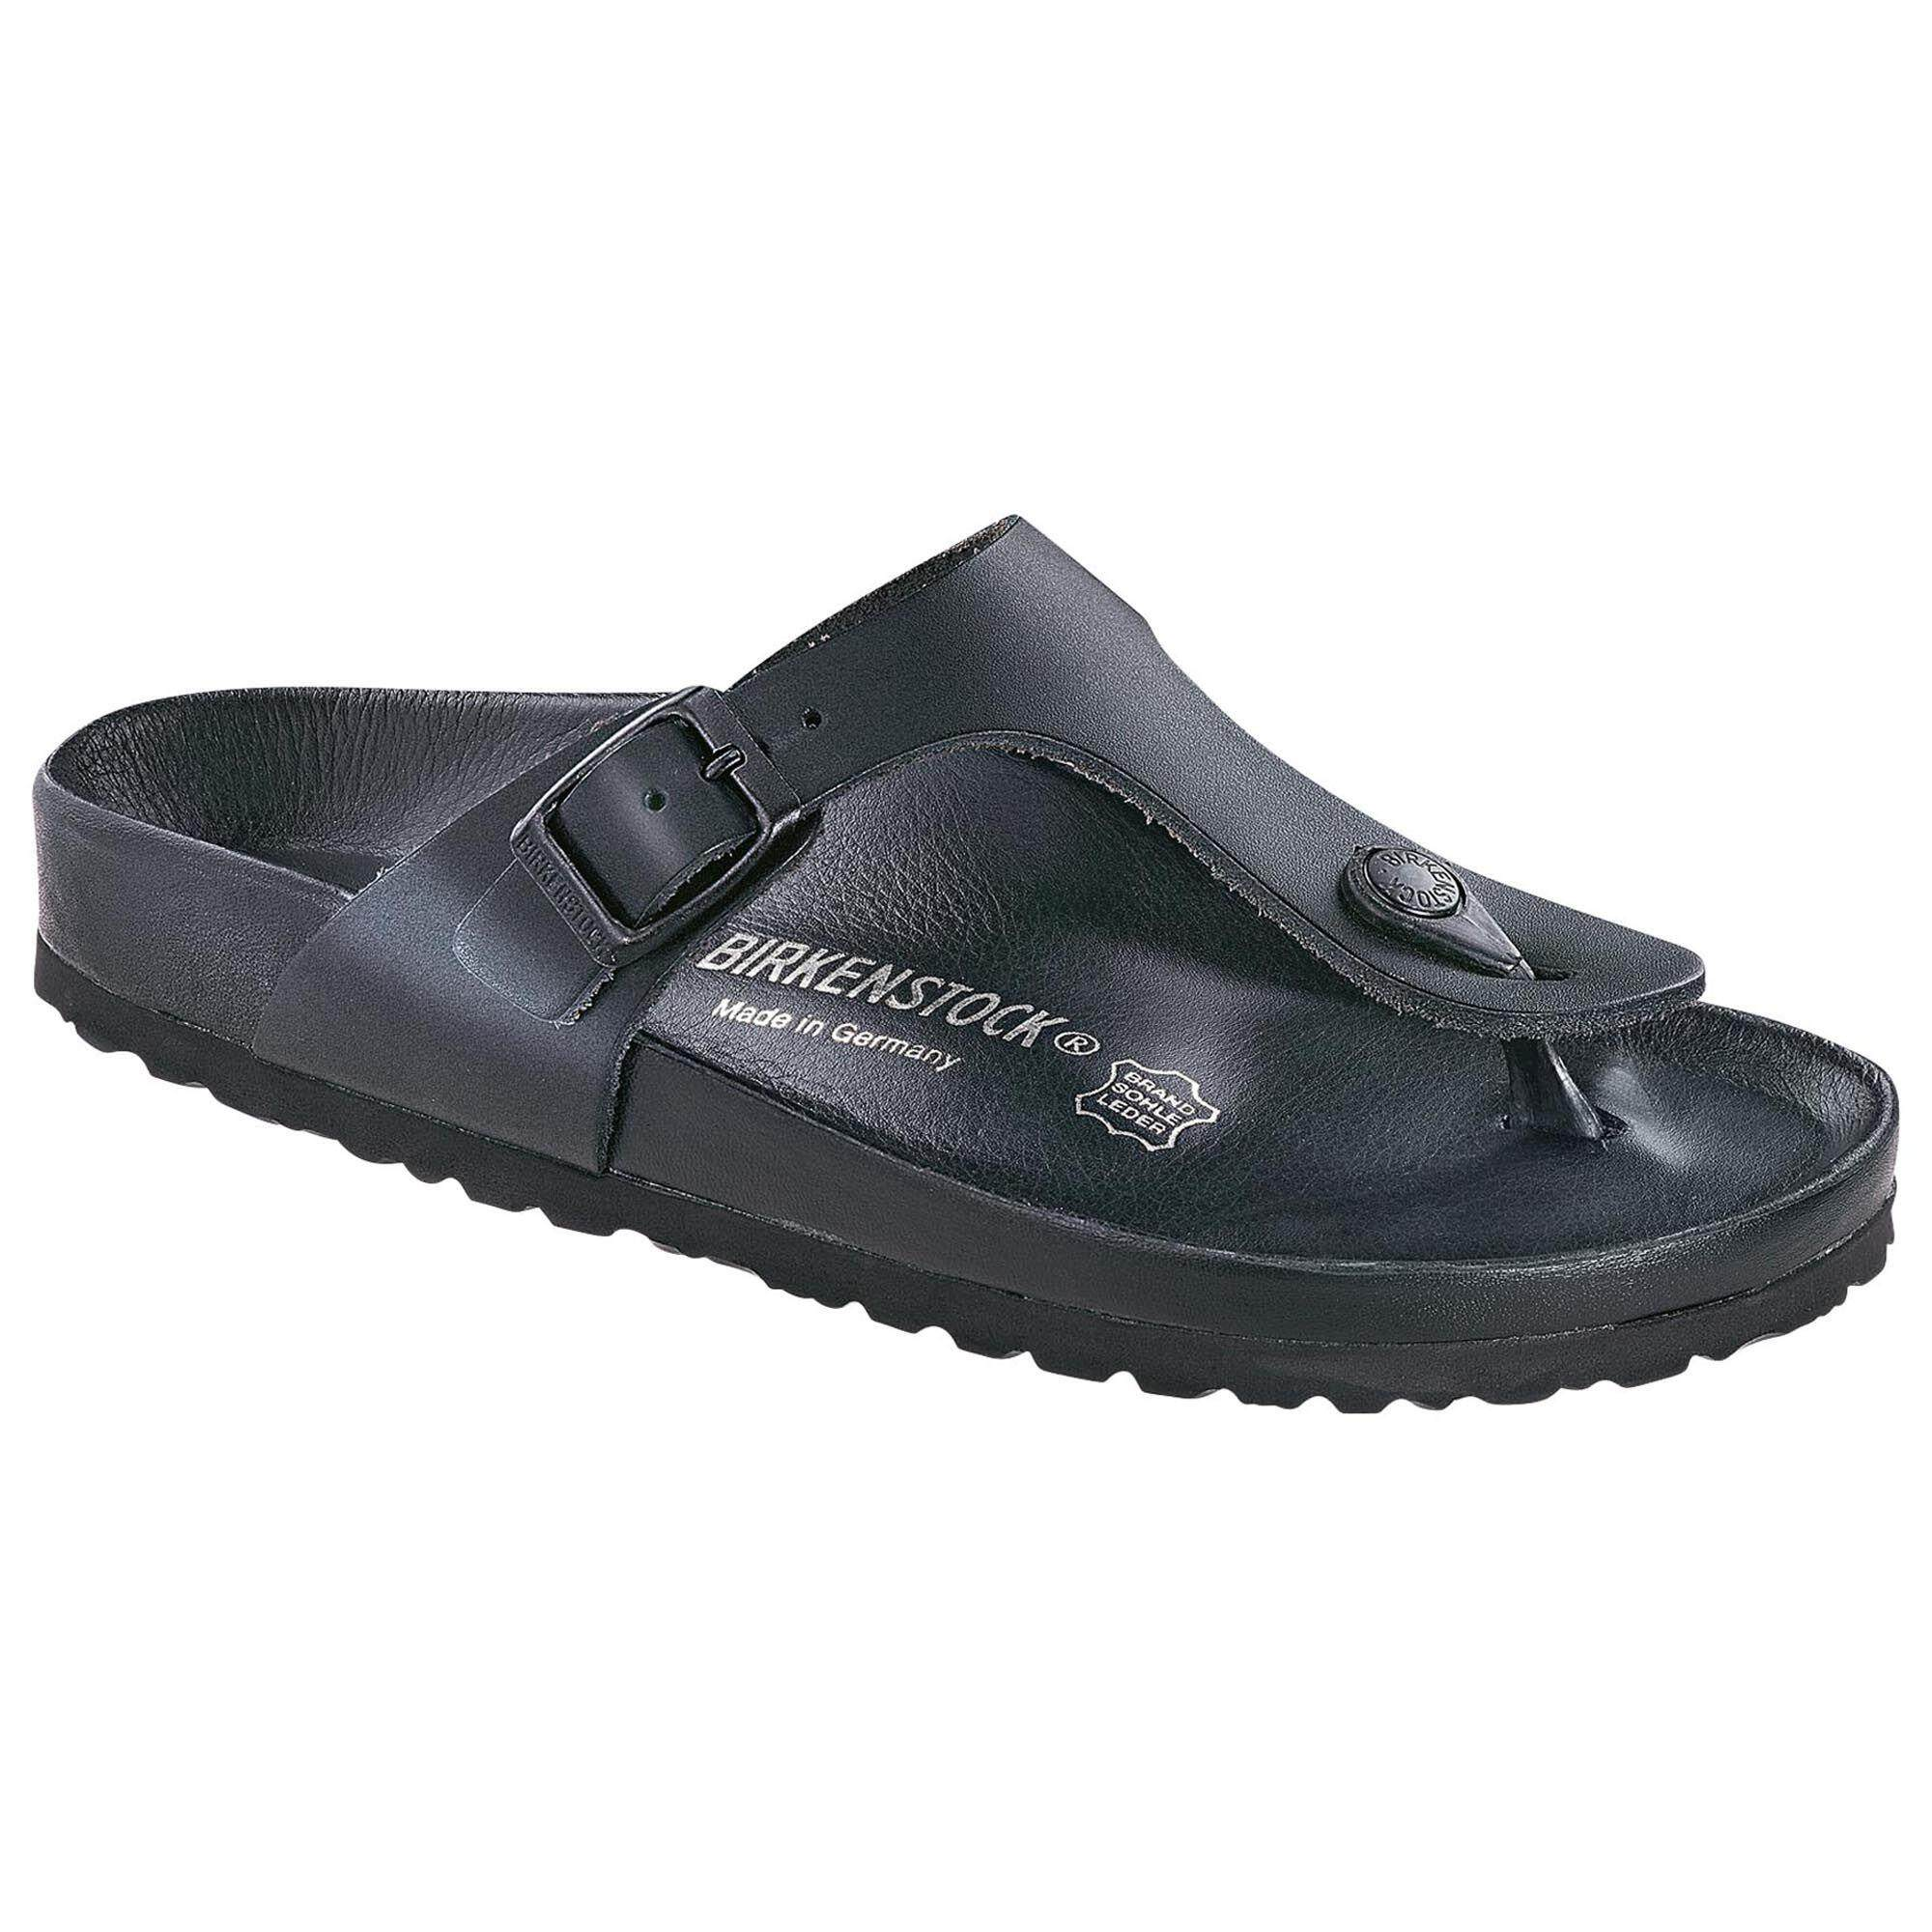 037f4c8a8f90 Birkenstocks Women Sandals Women Thong Gizeh Natural Leather Black